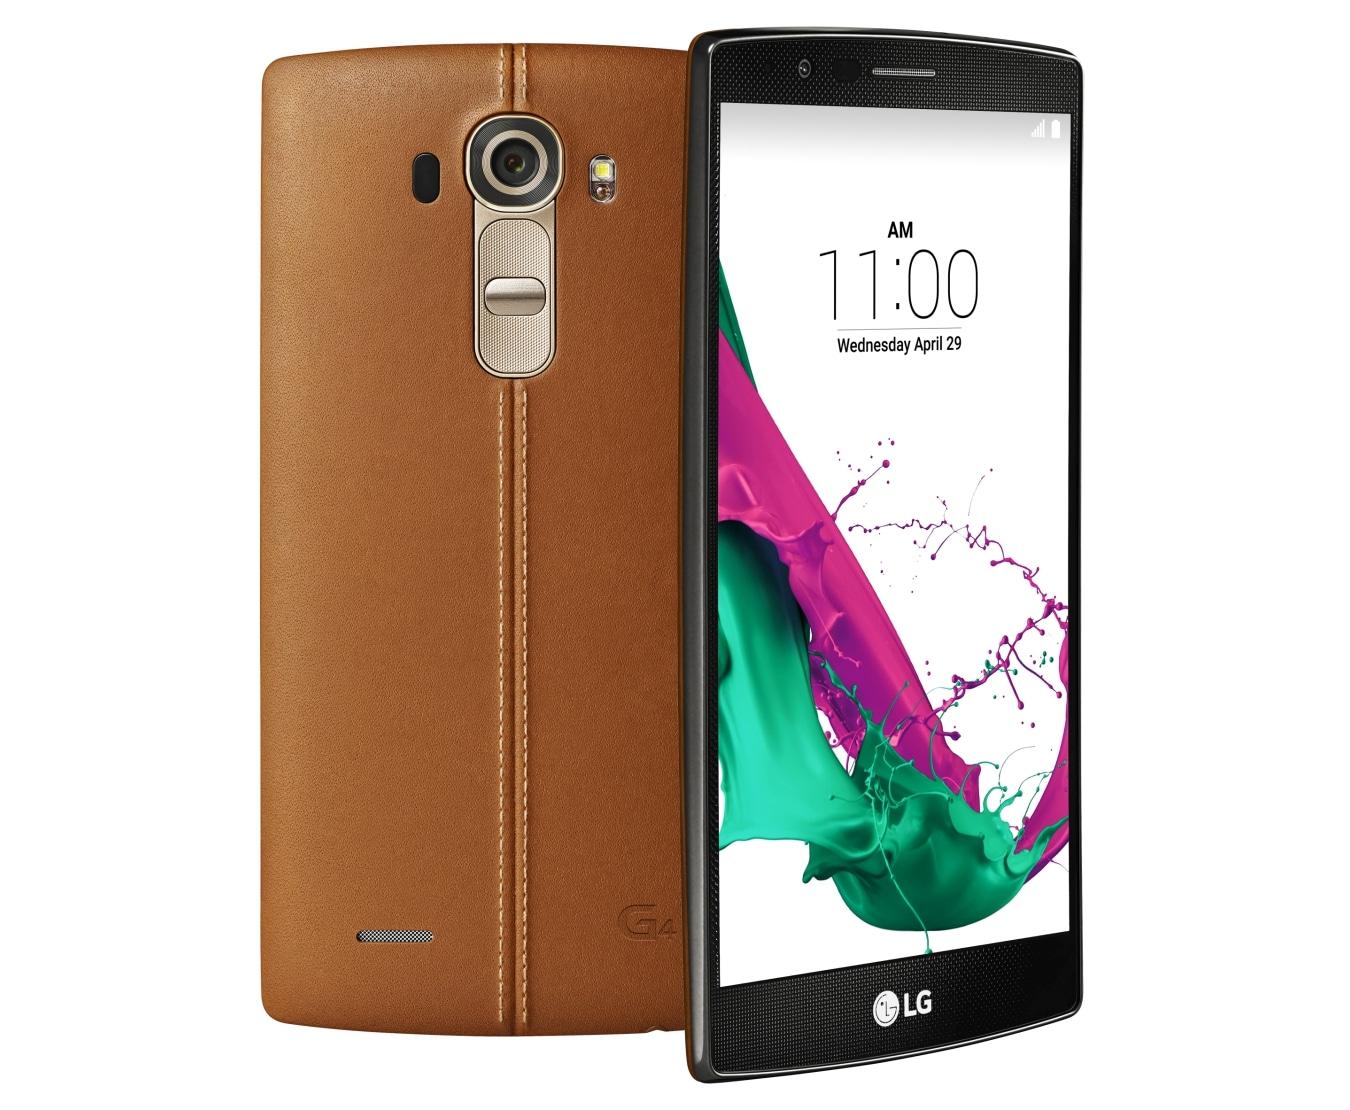 lg g4 smartphone lgh815 lg australia rh lg com AT&T Phone Manuals Verizon Cell Phone Manual